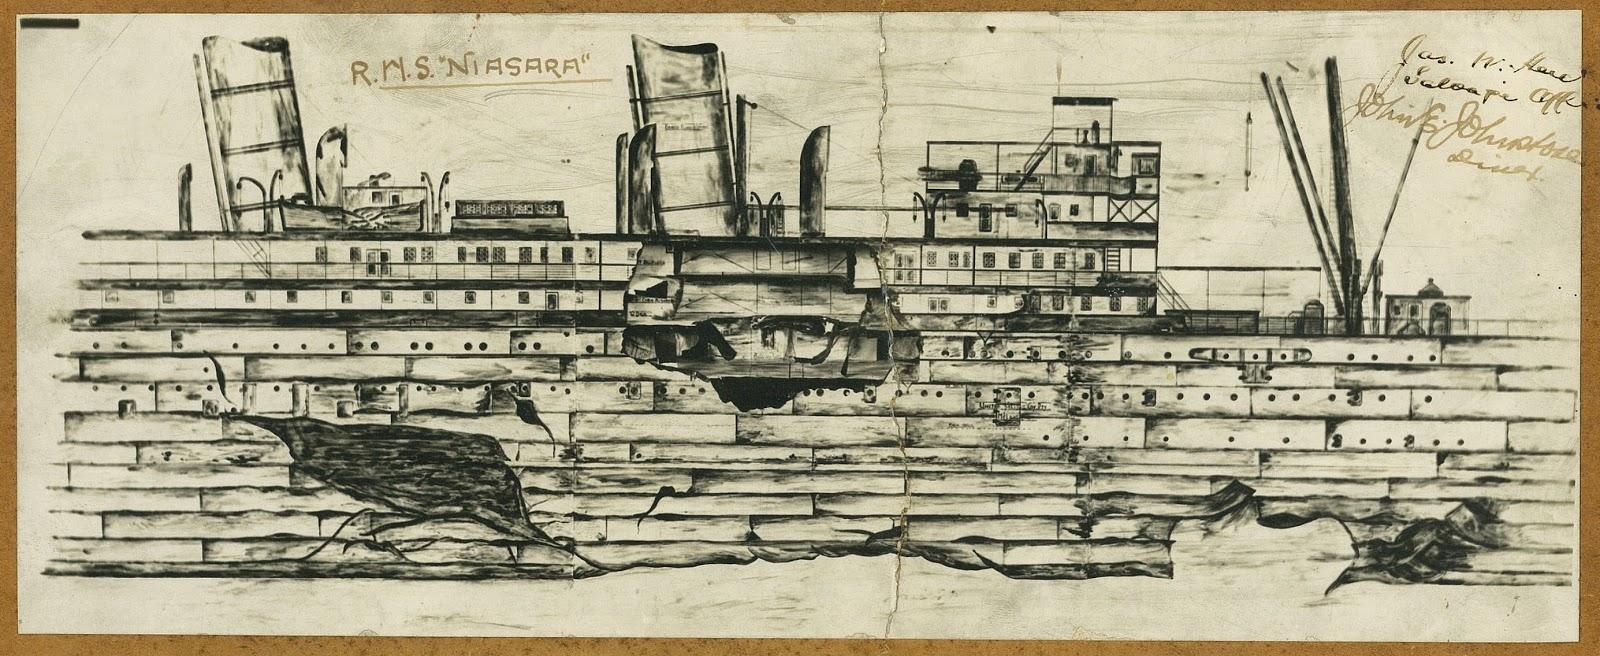 https://rfacdn.nz/maritime/assets/media/drawing-of-mine-damage-to-niagara-june-1940-vnzmm-4325.jpg